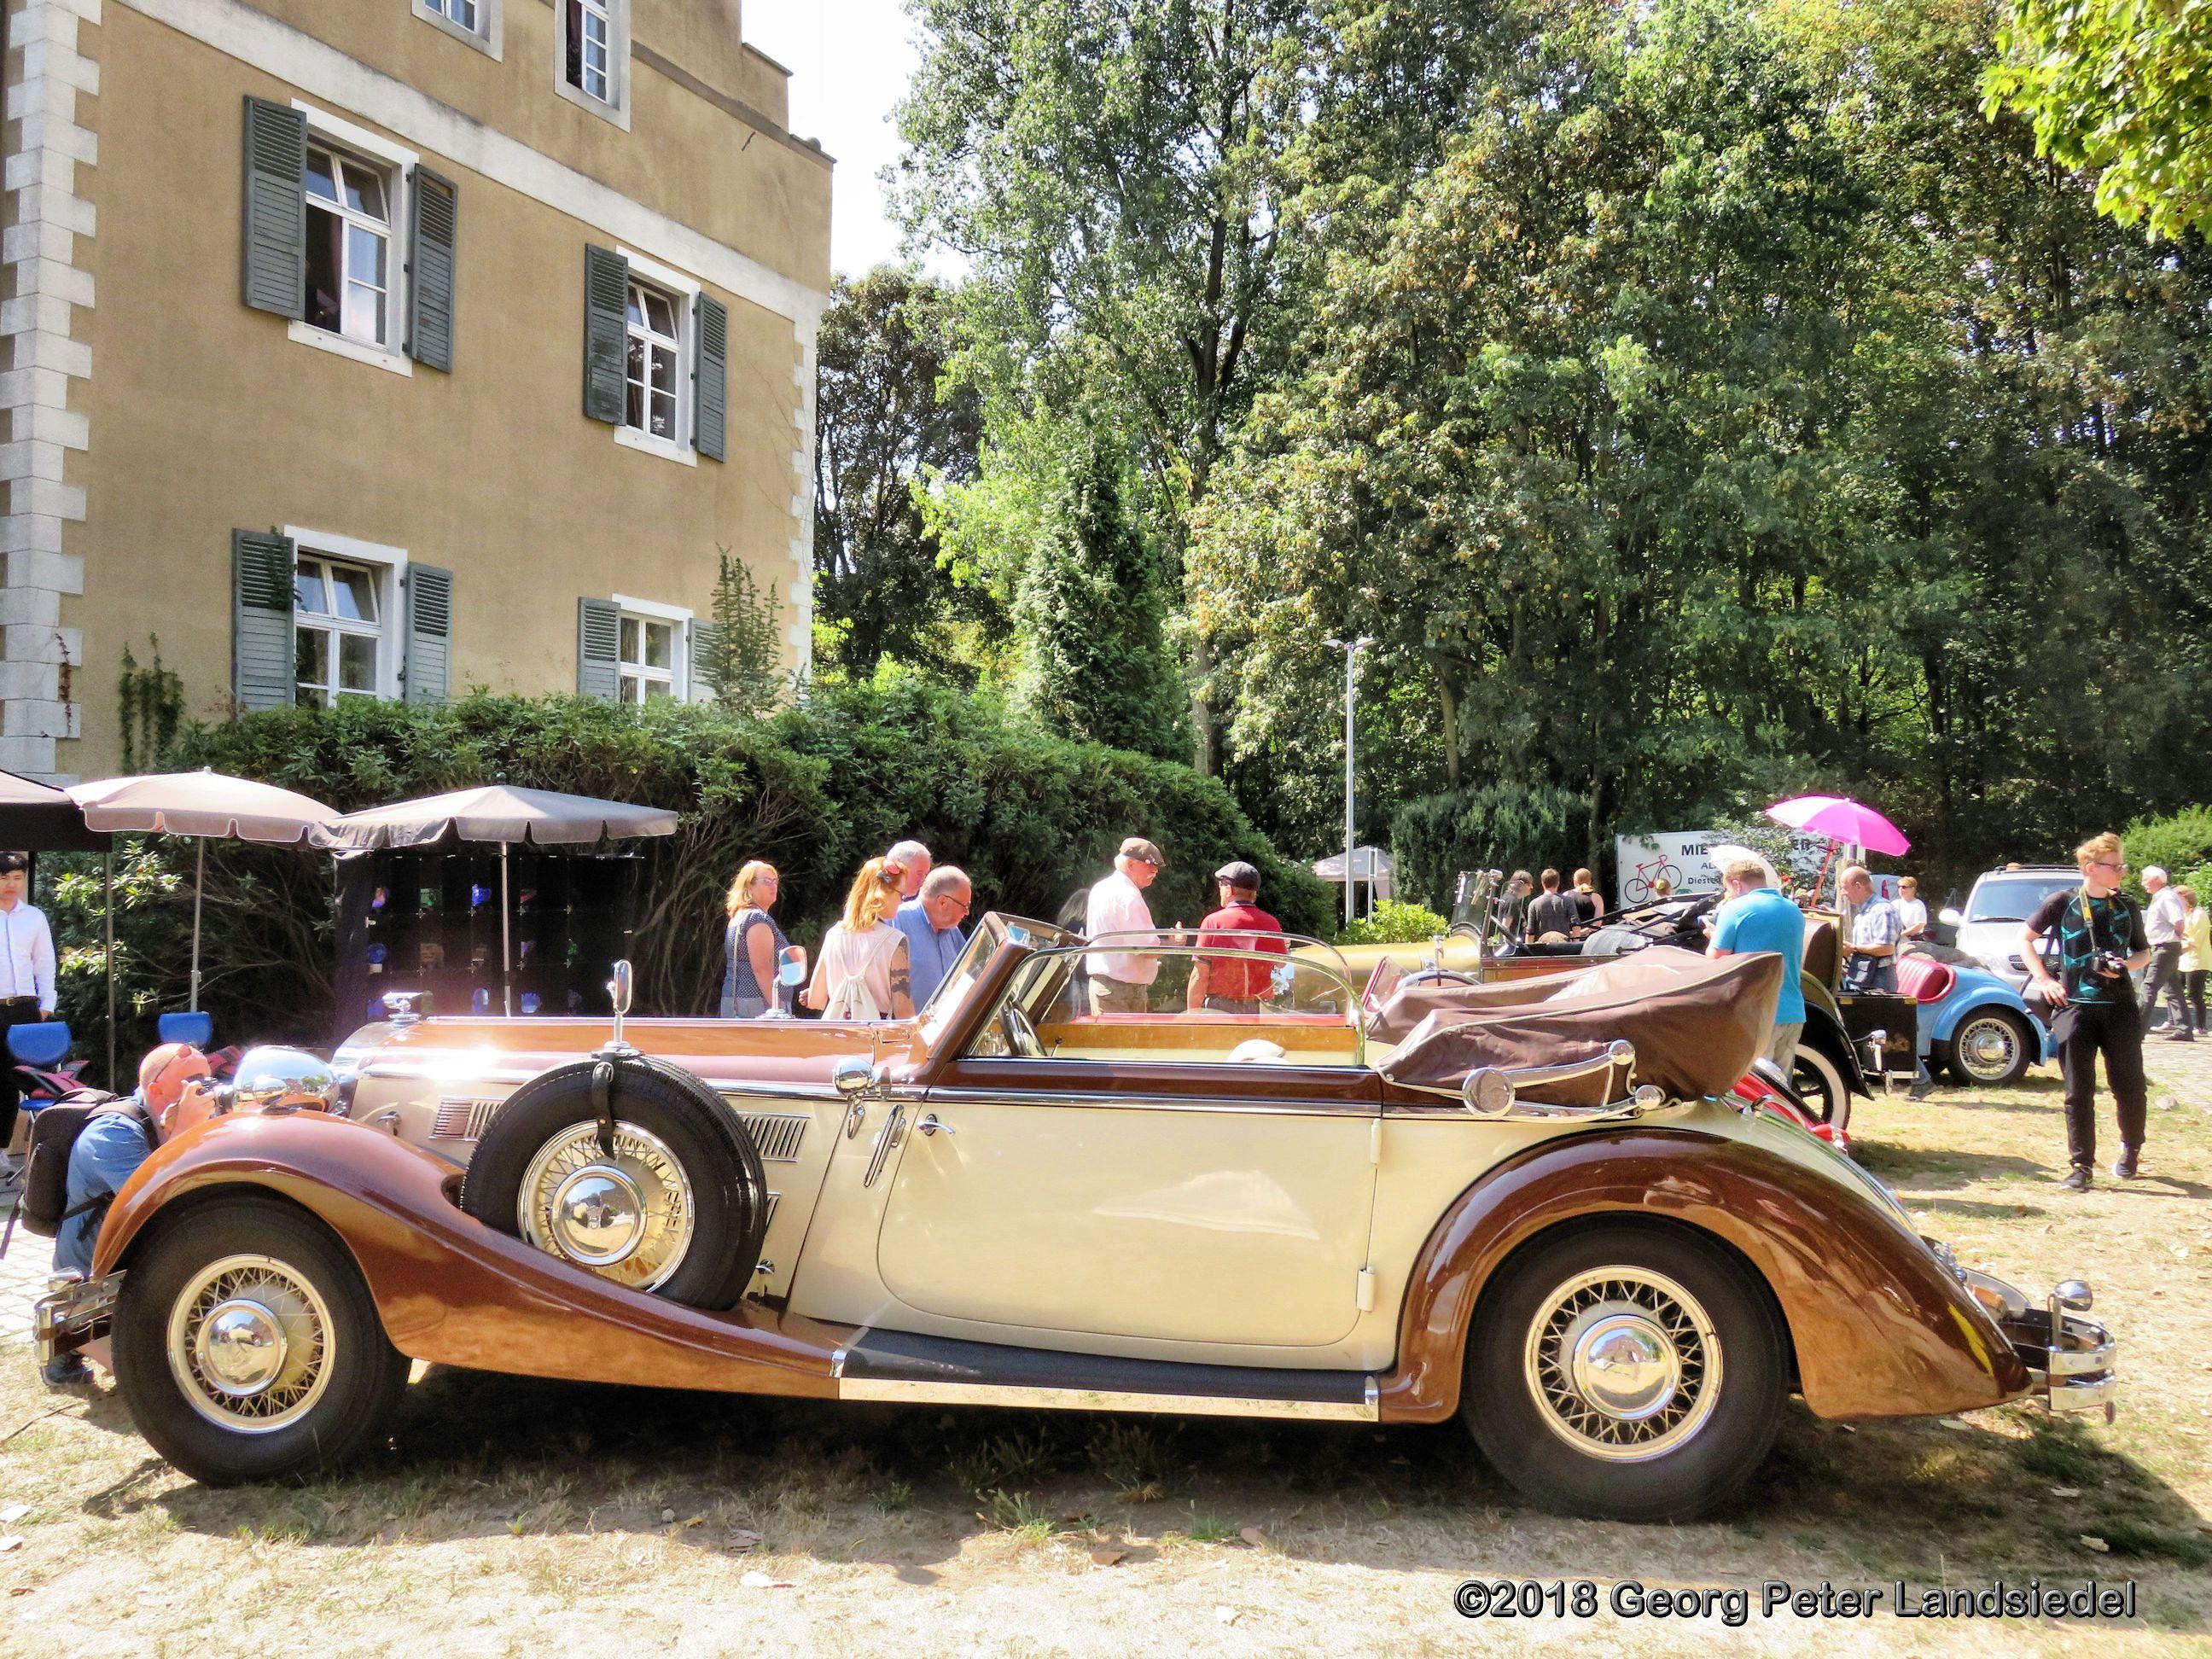 Horch 853 Cabriolet, 1935